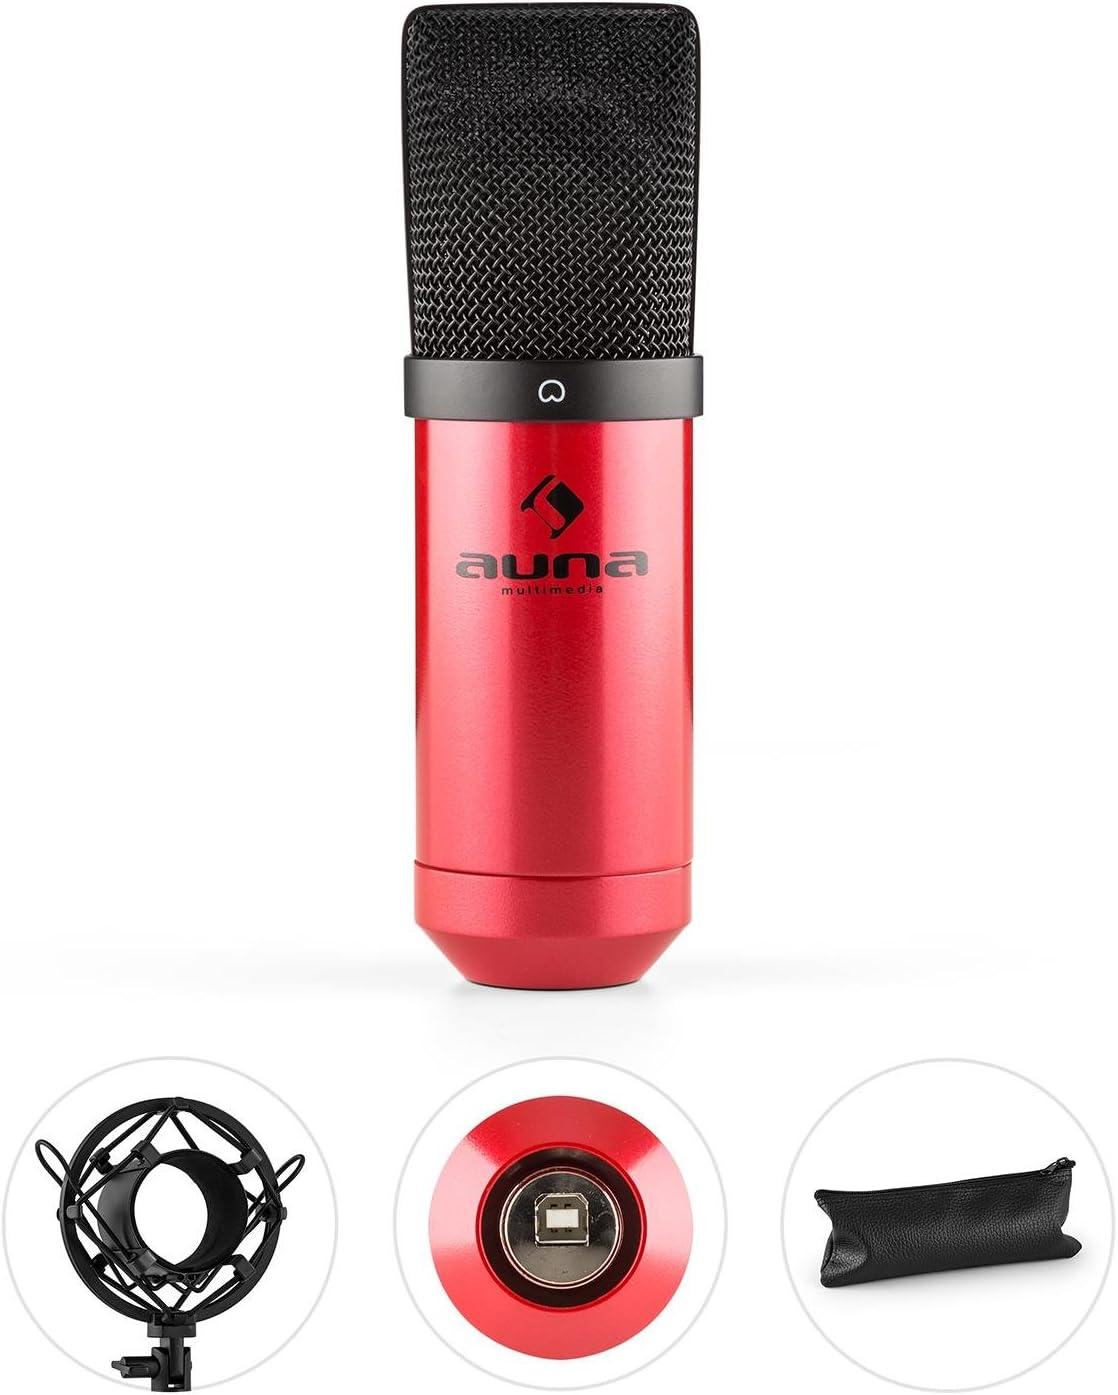 USB-Mikrofon Adapter Kondensatormikrofon mit Schwenkarm und Tisch-Mikrofonhalterung Mikrofonhalter auna MIC-900B 320Hz-18KHz Mikrofonspinne 3//8 zu 5//8 Studio Mikrofon Set schwarz